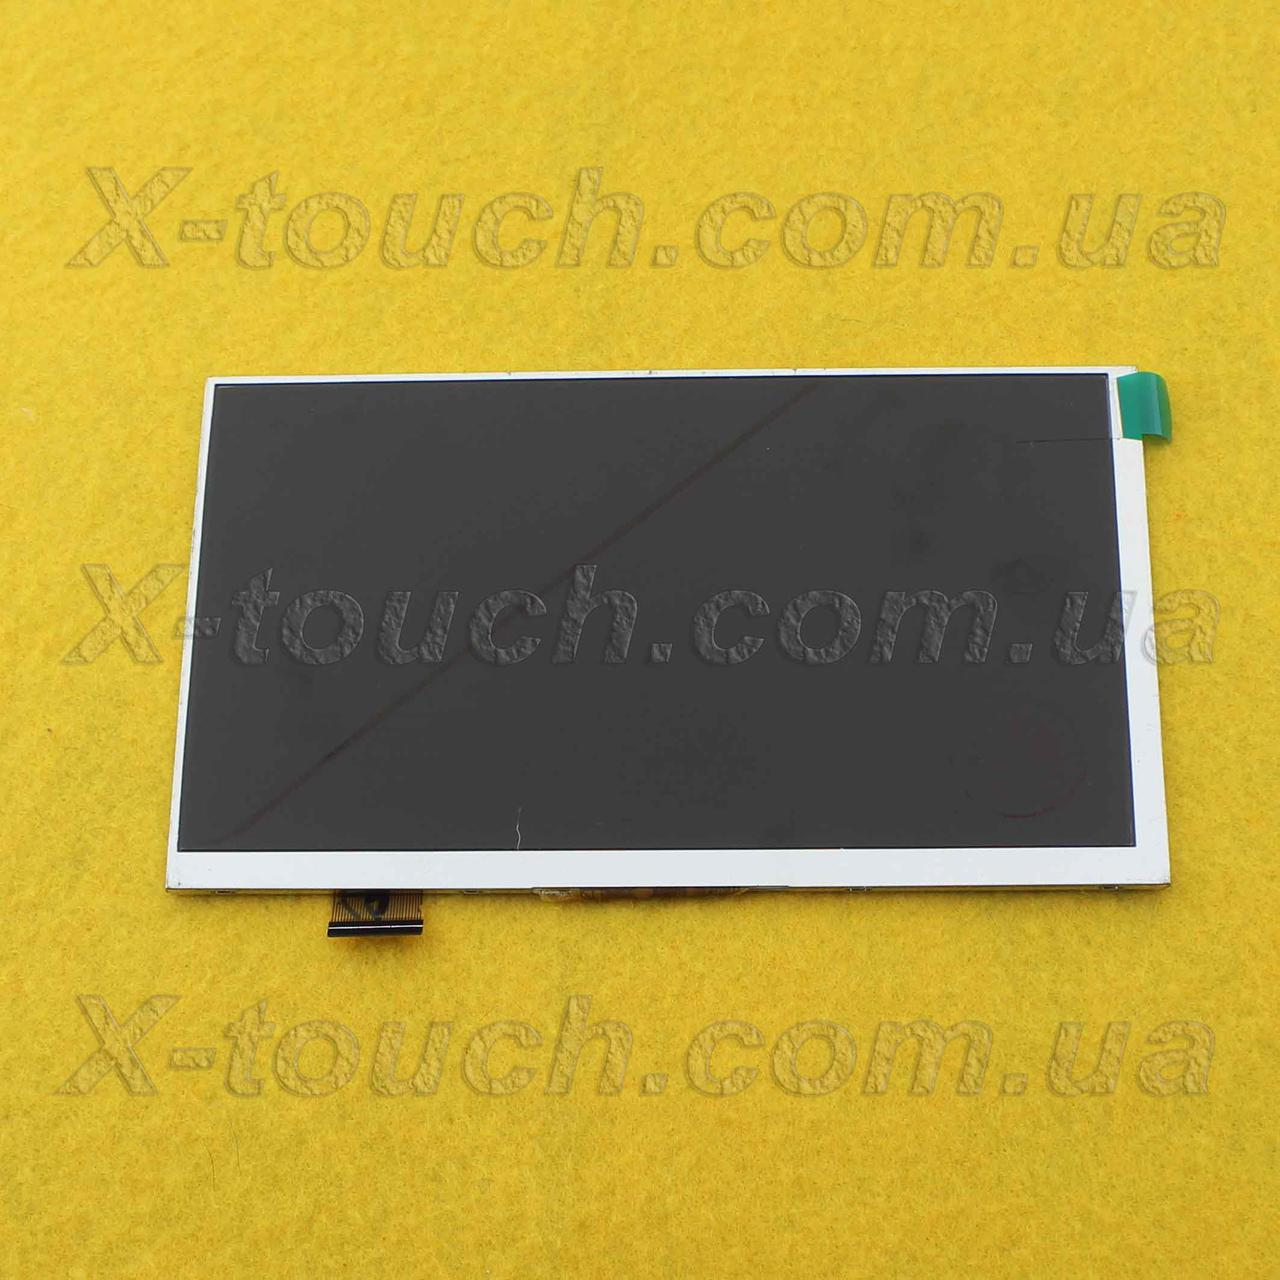 Матриця,екран, дисплей FY07021DI26A164 для планшета